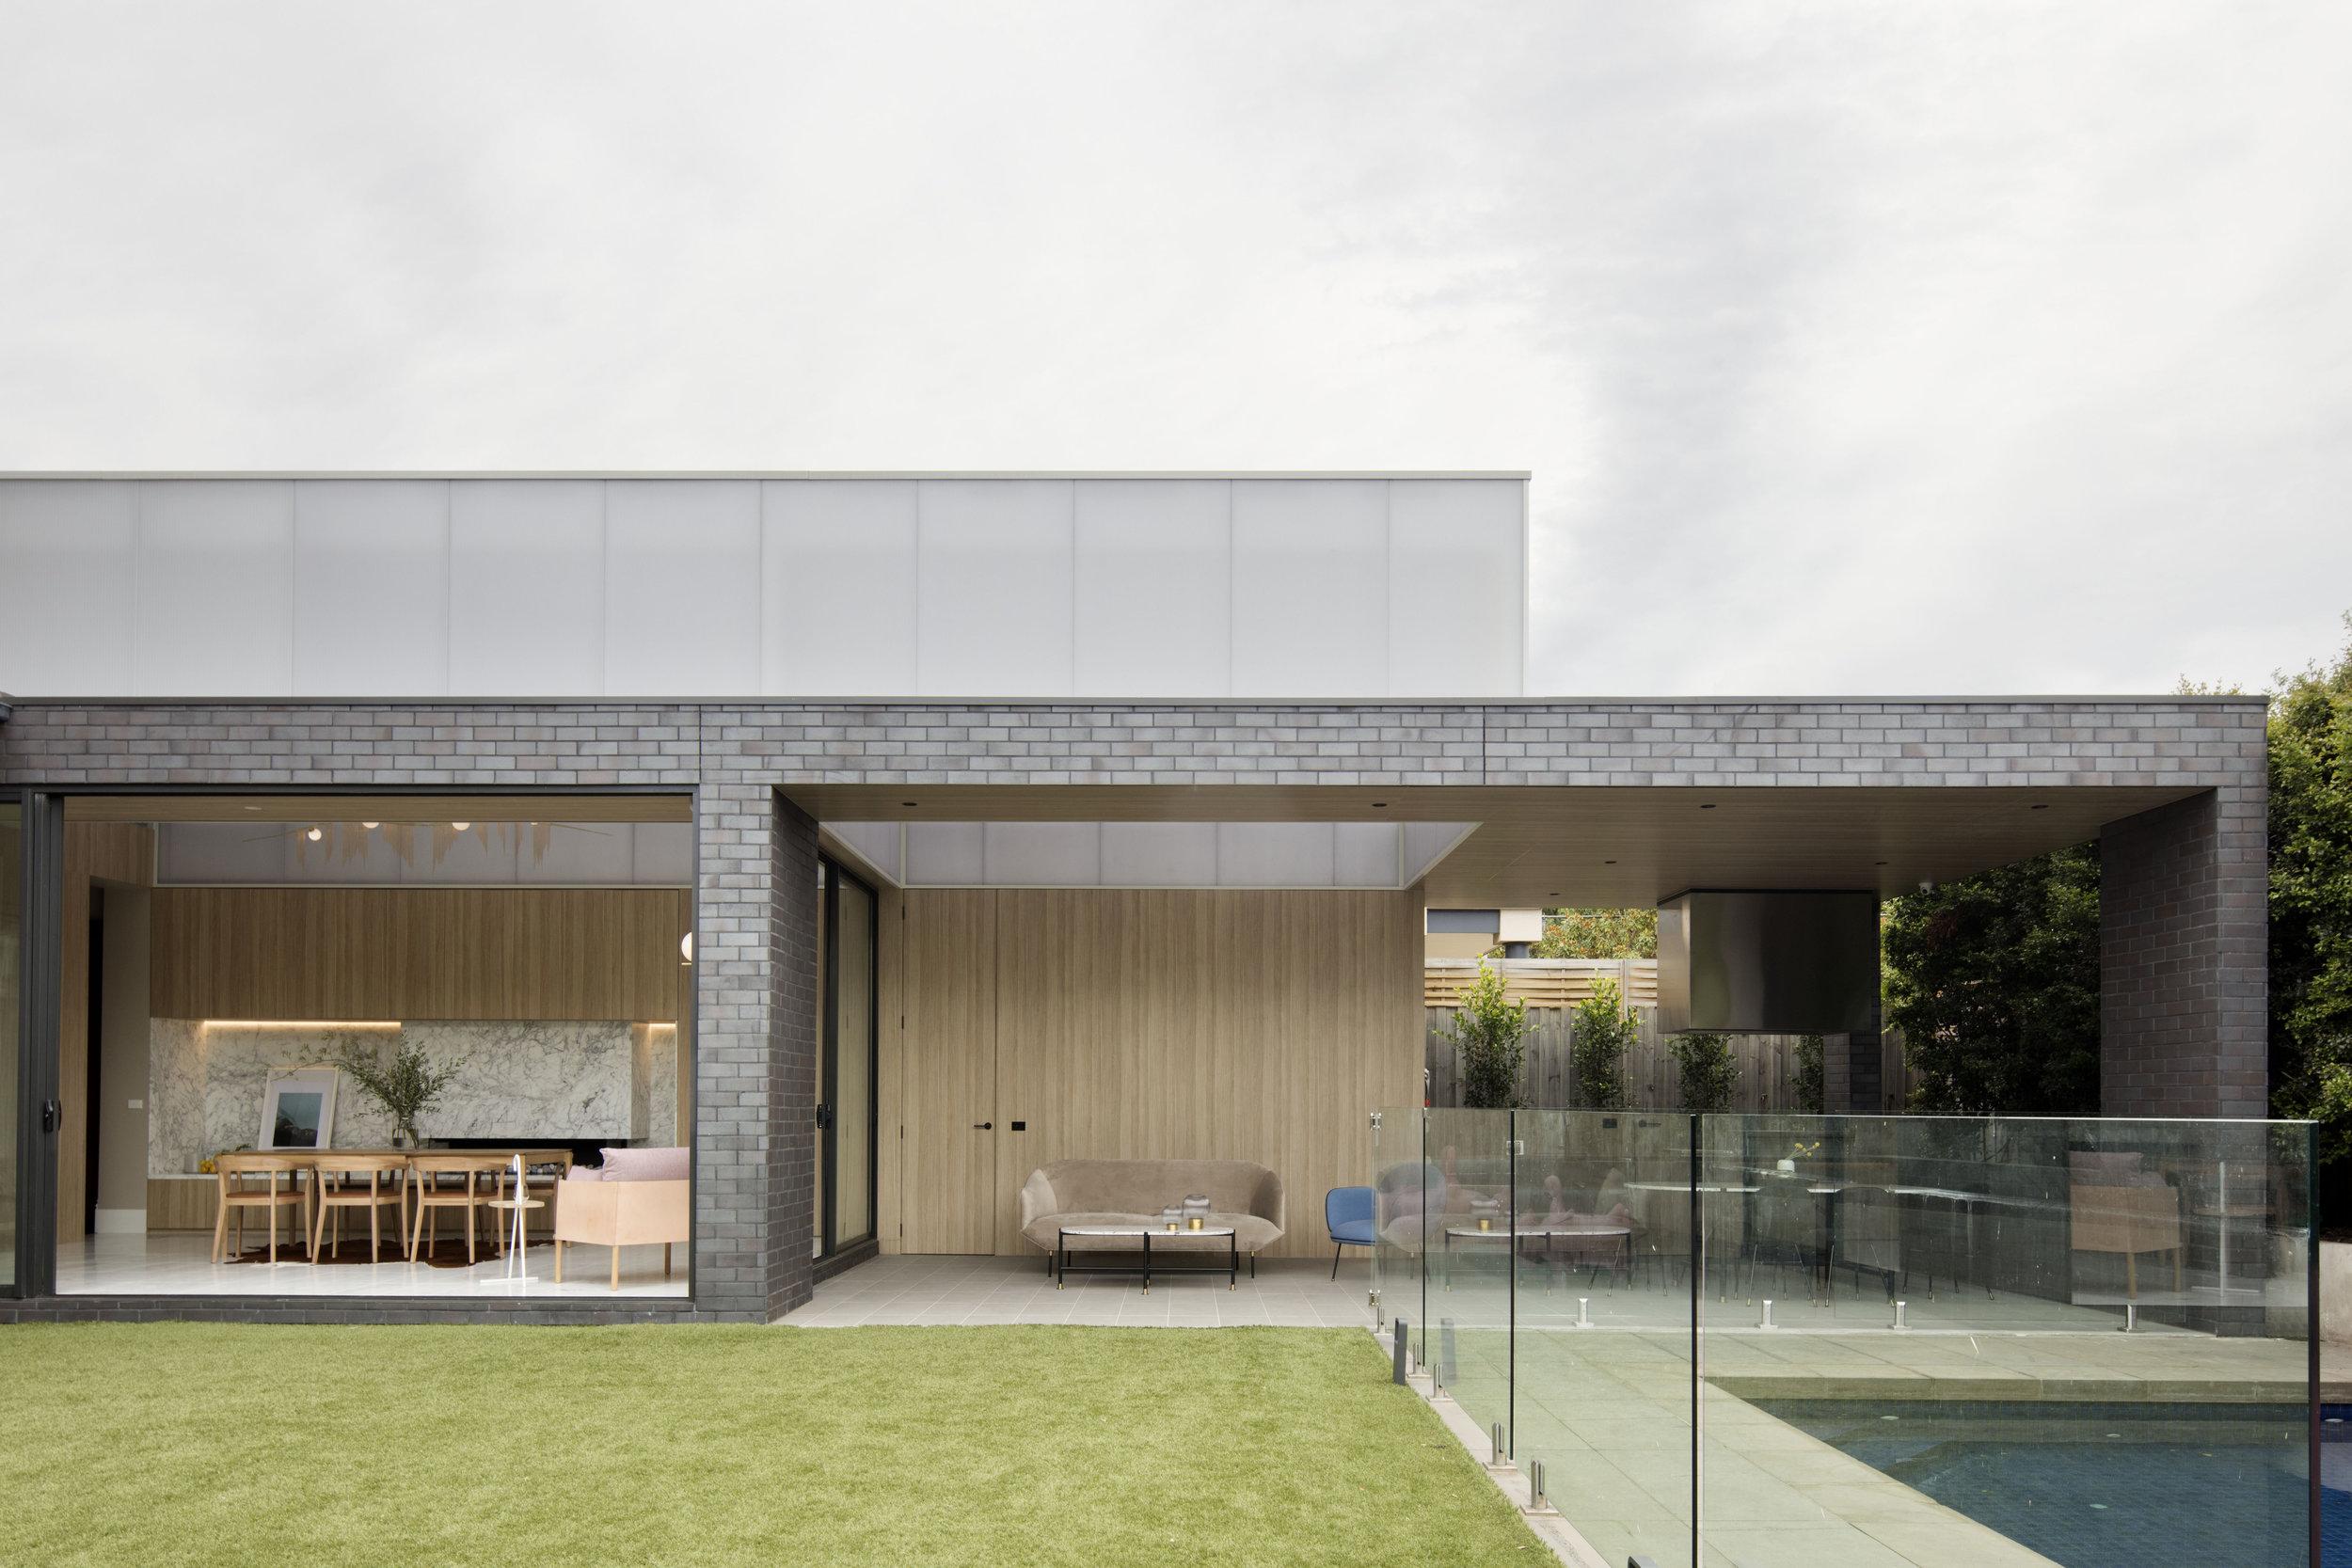 Pitch_Architecture_Lantern House_7